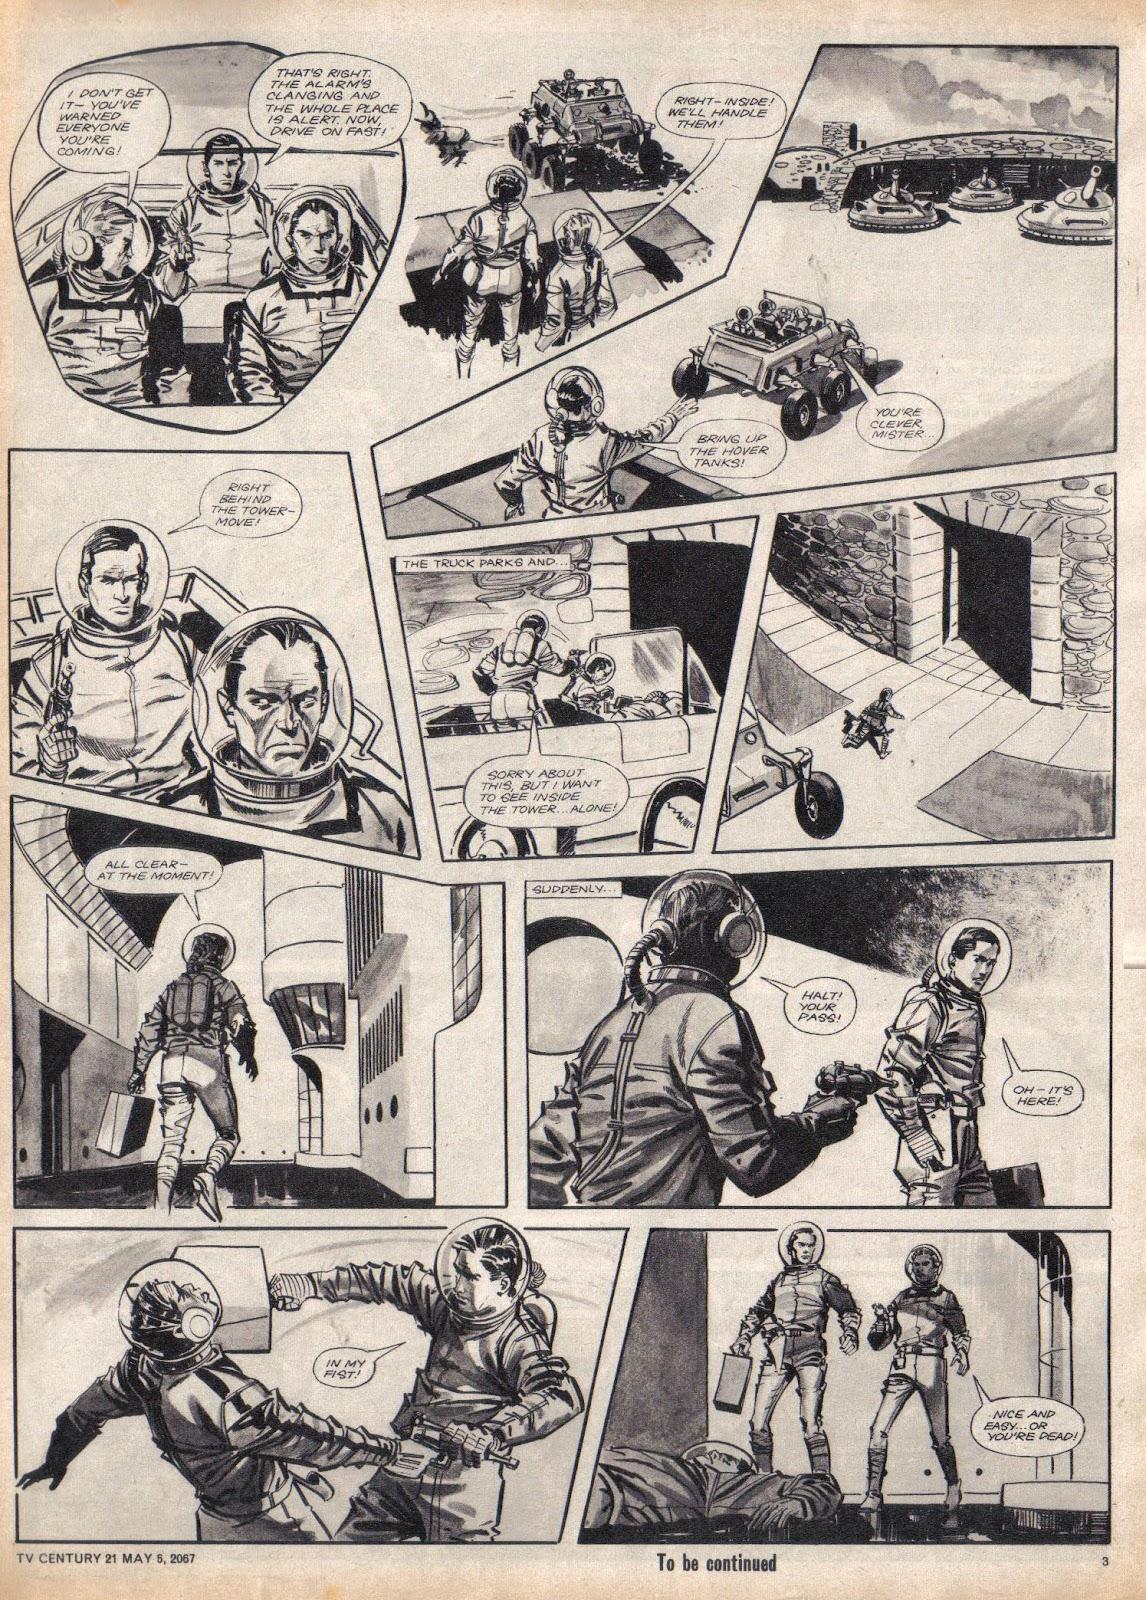 TV Century 21 (TV 21) issue 120 - Page 3